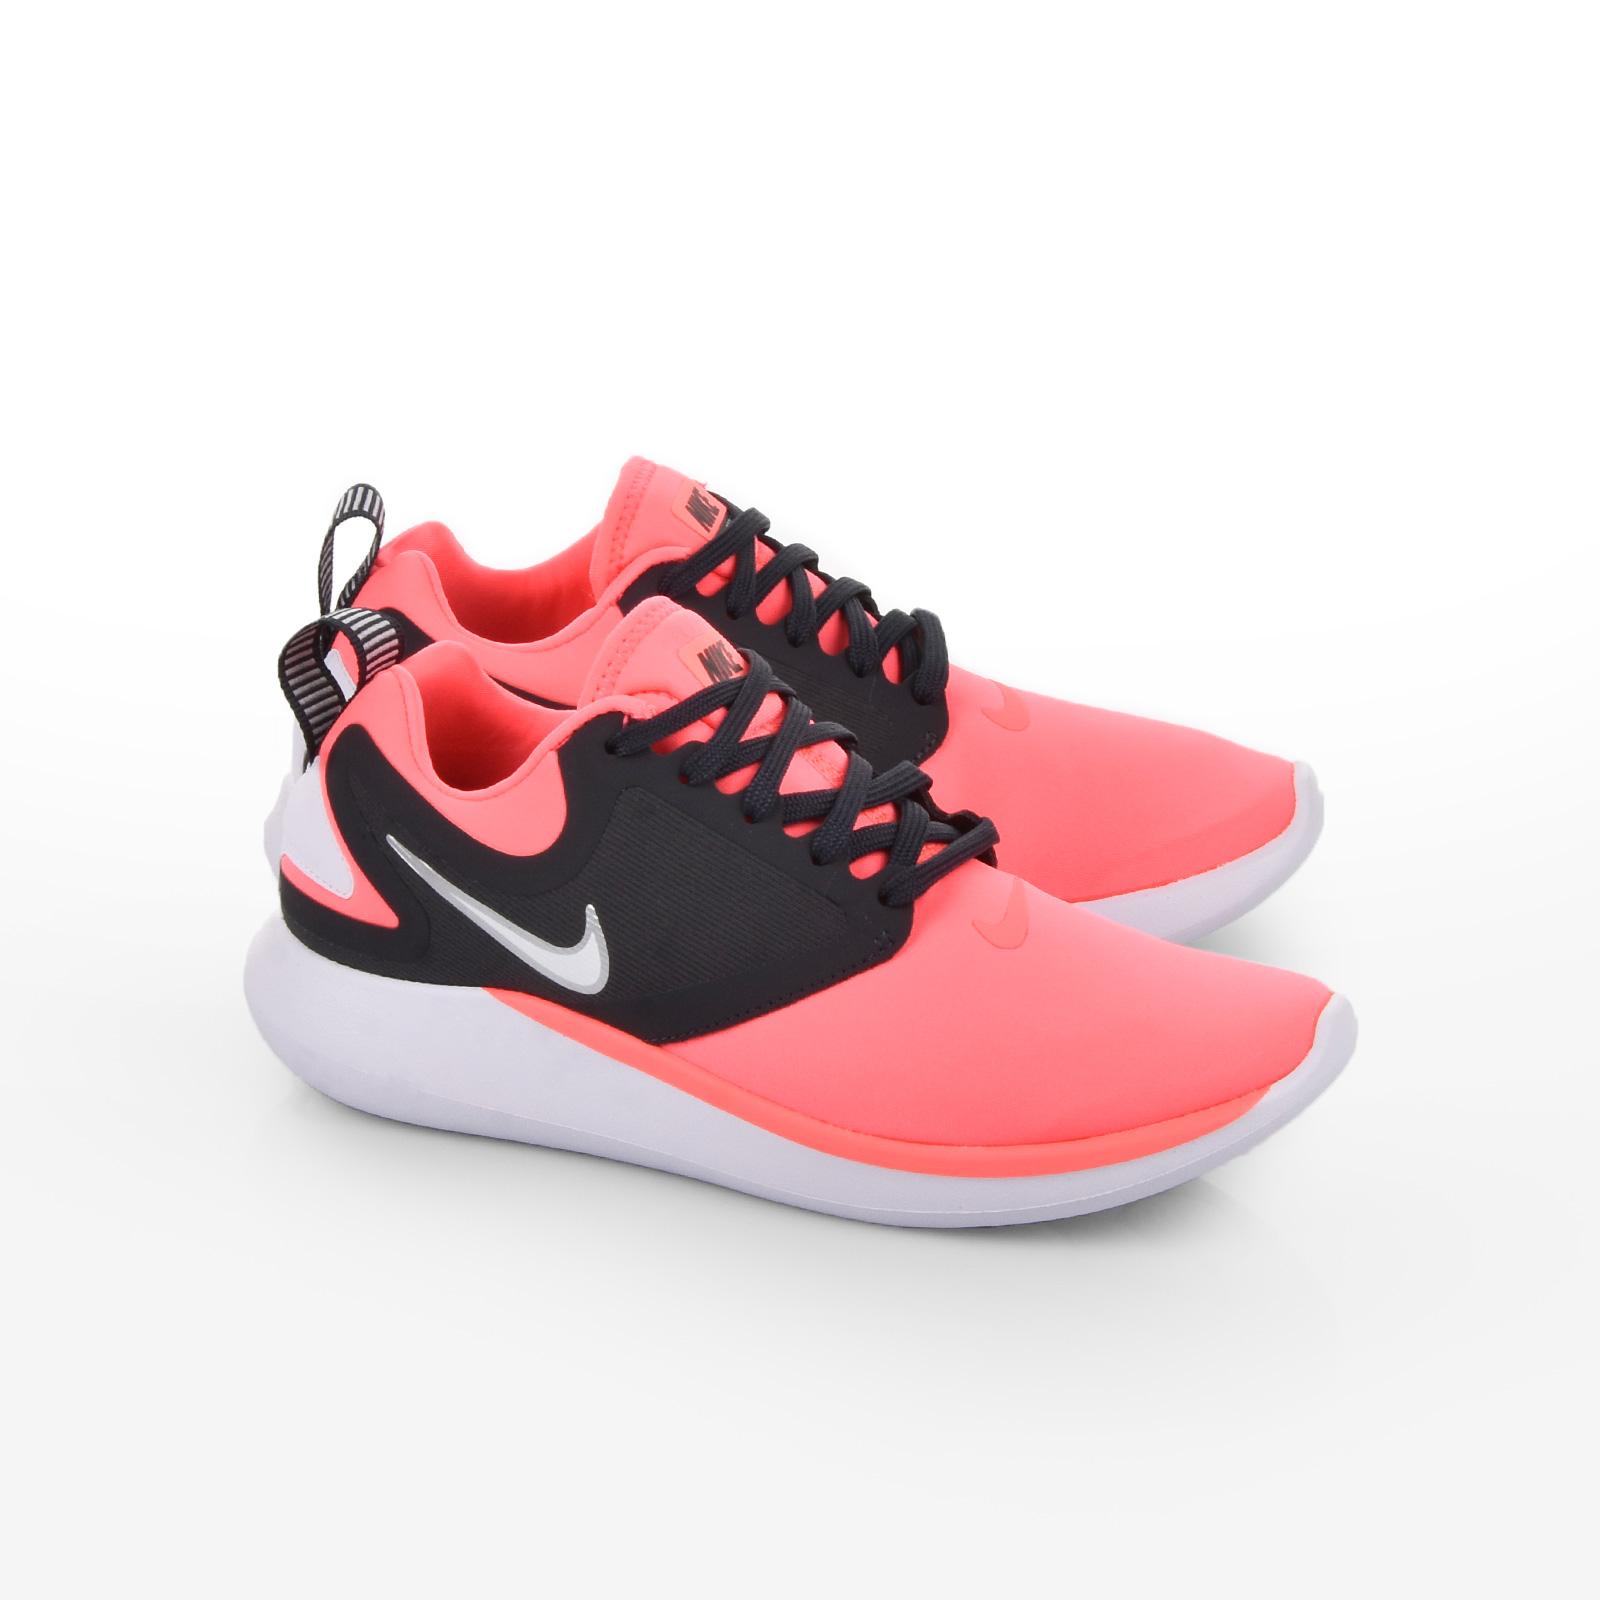 6a21ef5ca74 Γυναικεία Sneakers Παπούτσια - Σελίδα 147 | Outfit.gr